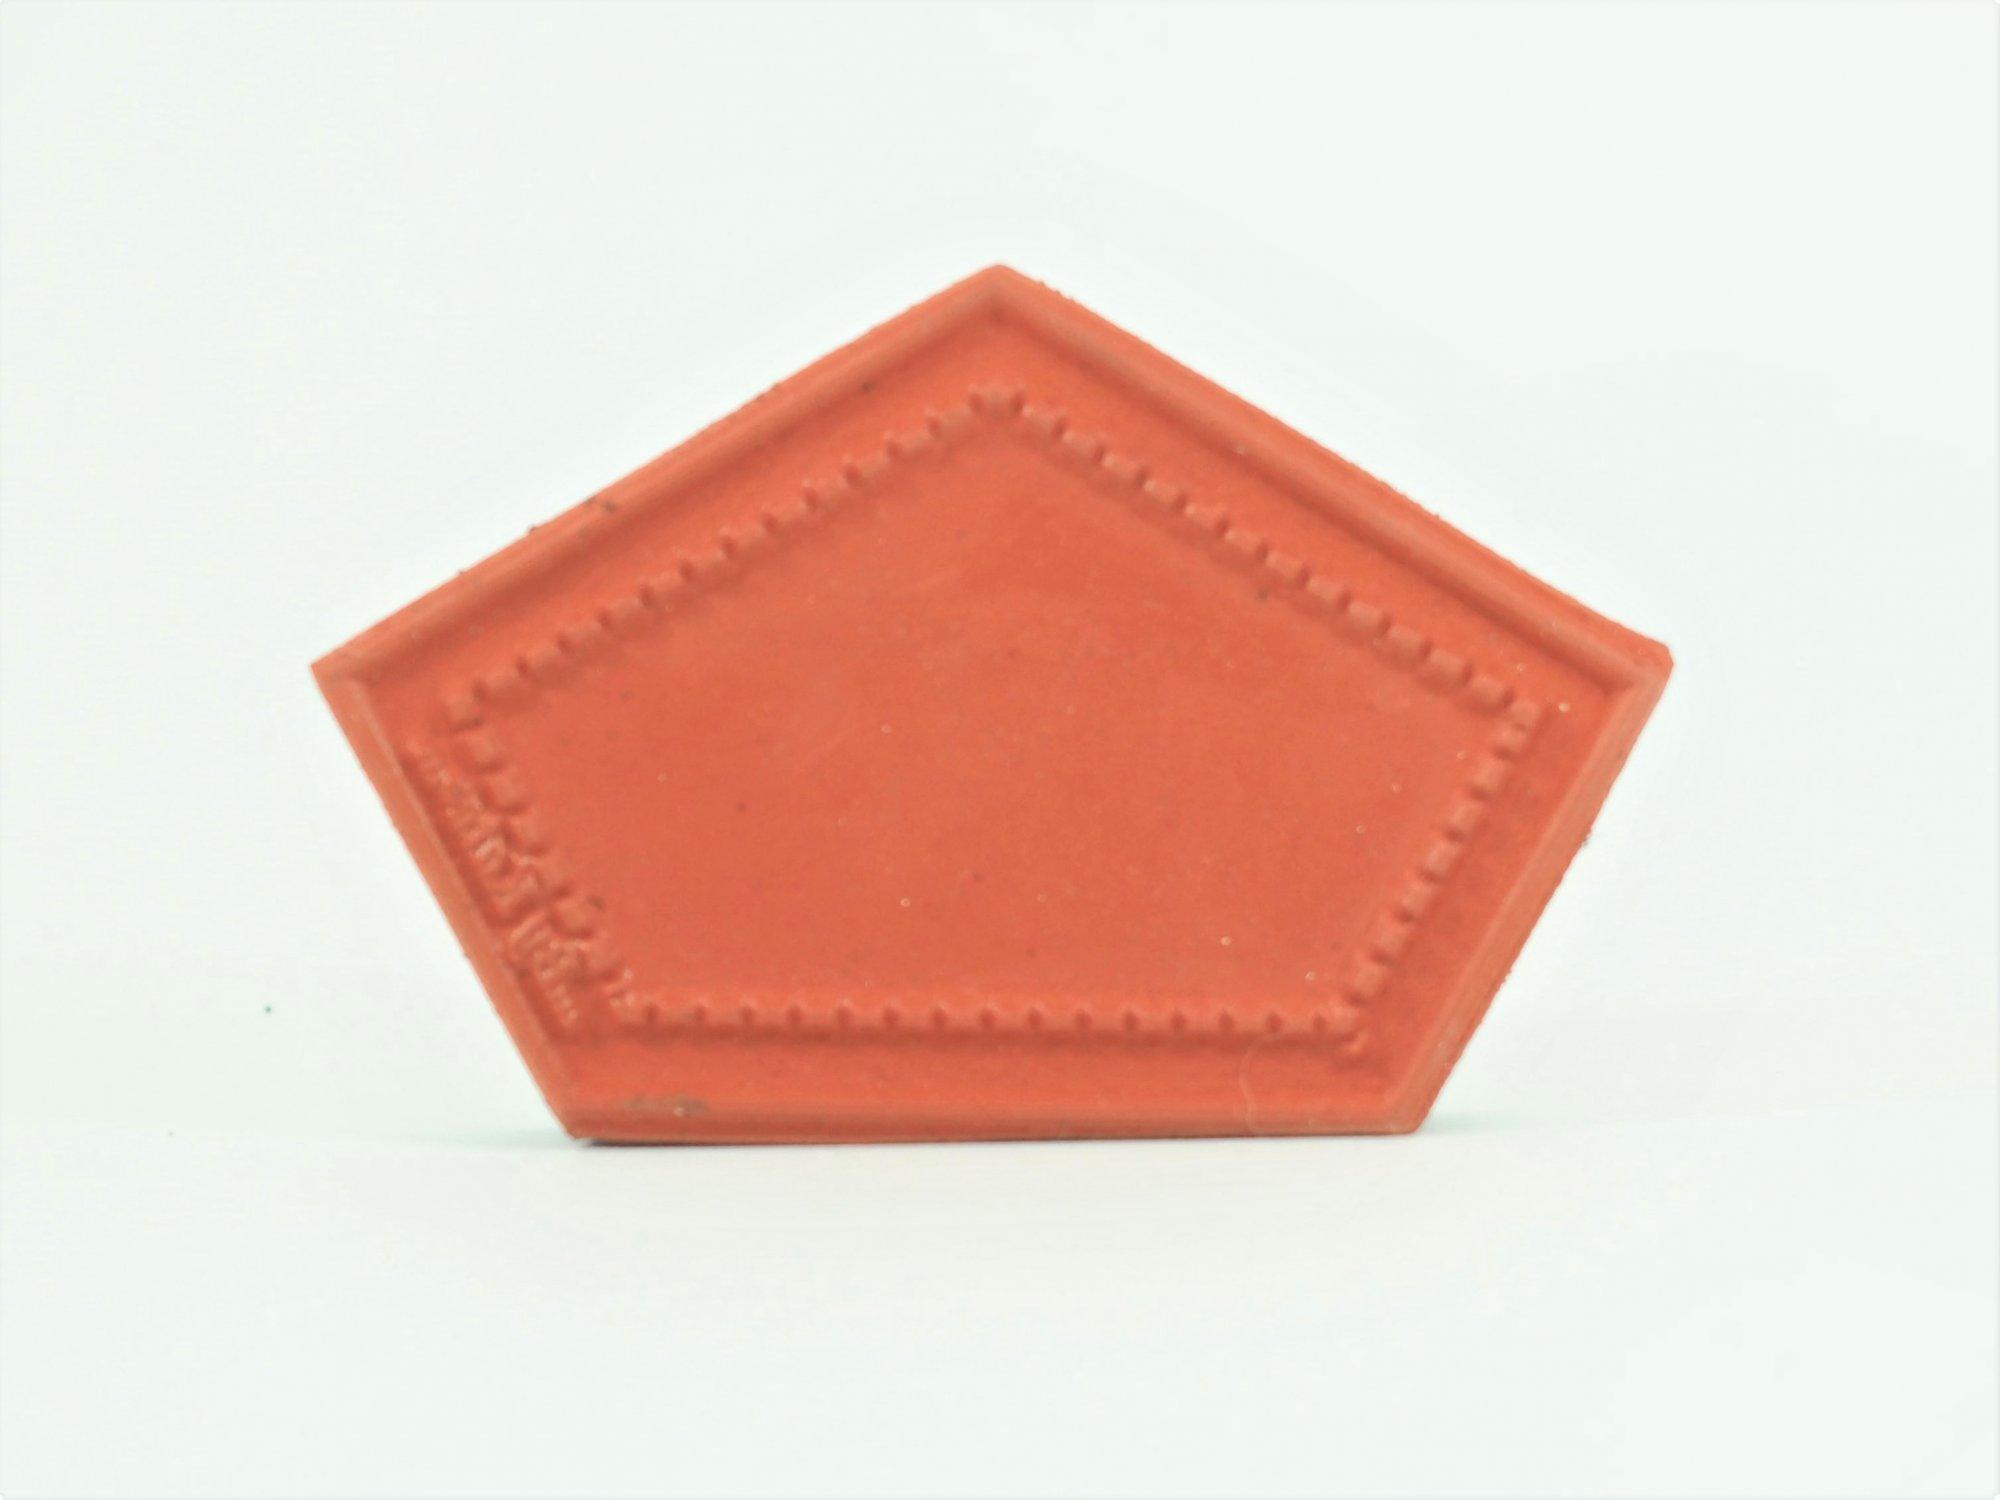 Pentagon - 2 inch Stamp